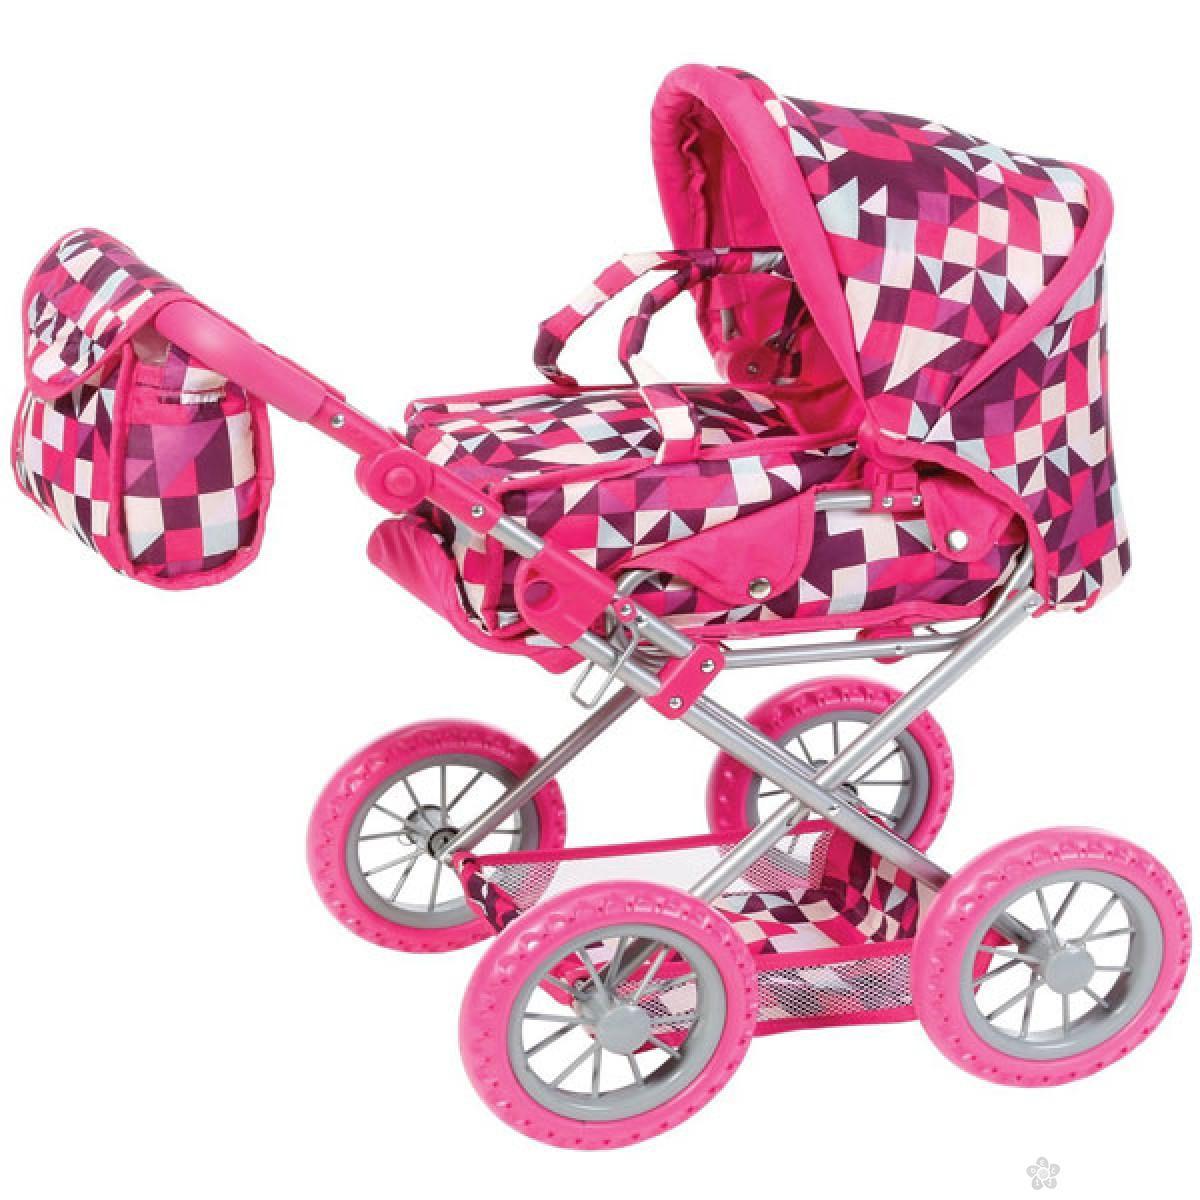 Kolica za lutke Knorr Toys Ruby Crazy Squares 63194